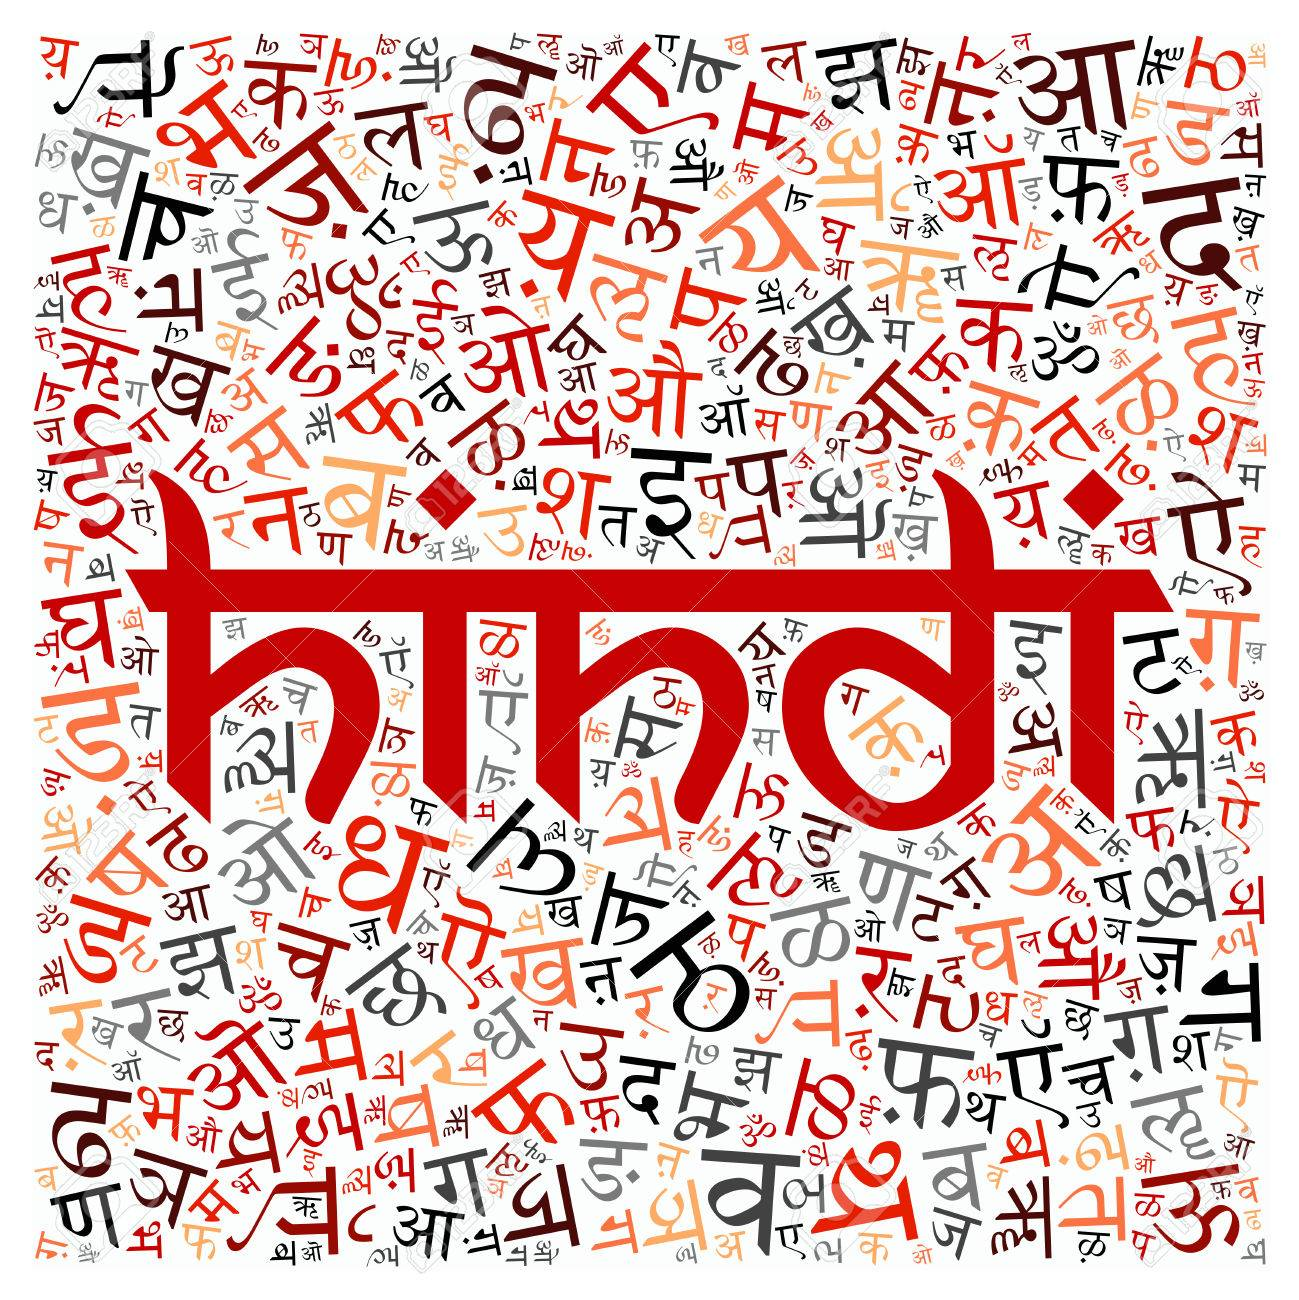 creative hindi alphabet texture background high resolution stock